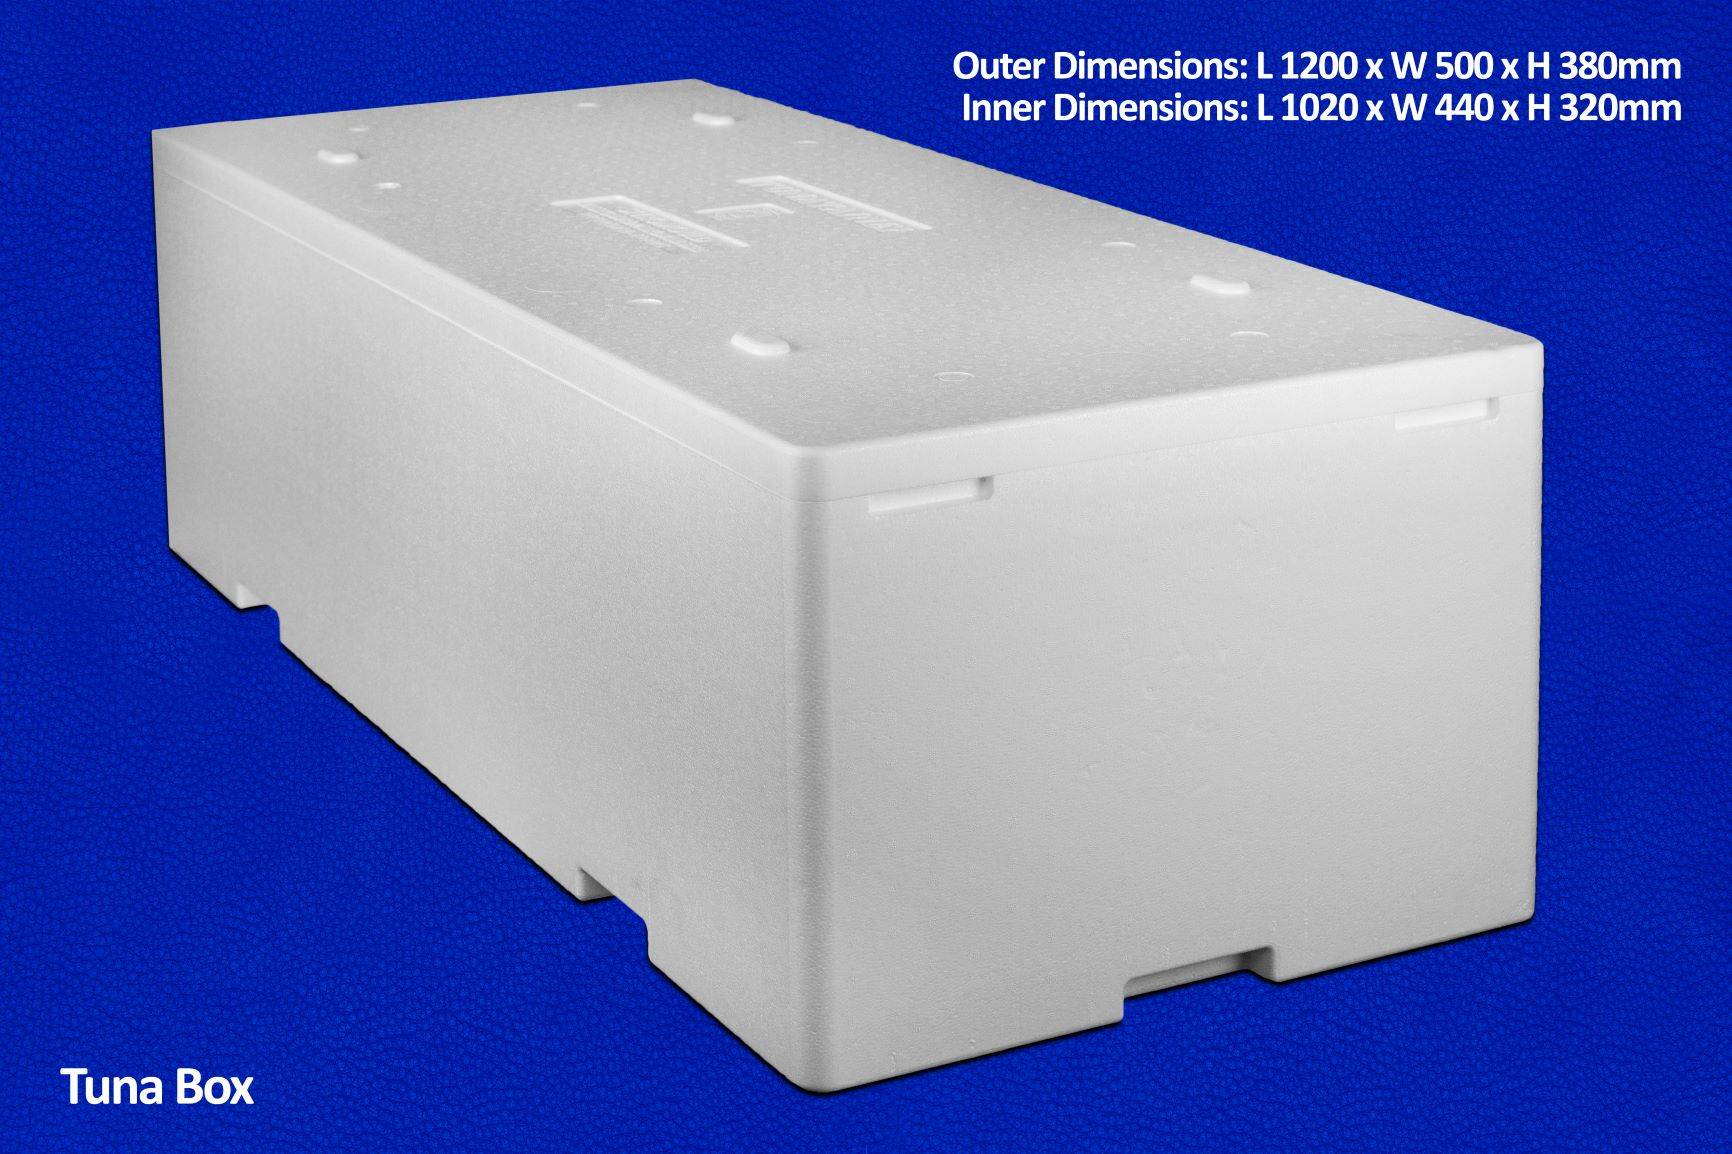 Tuna box dry ice container